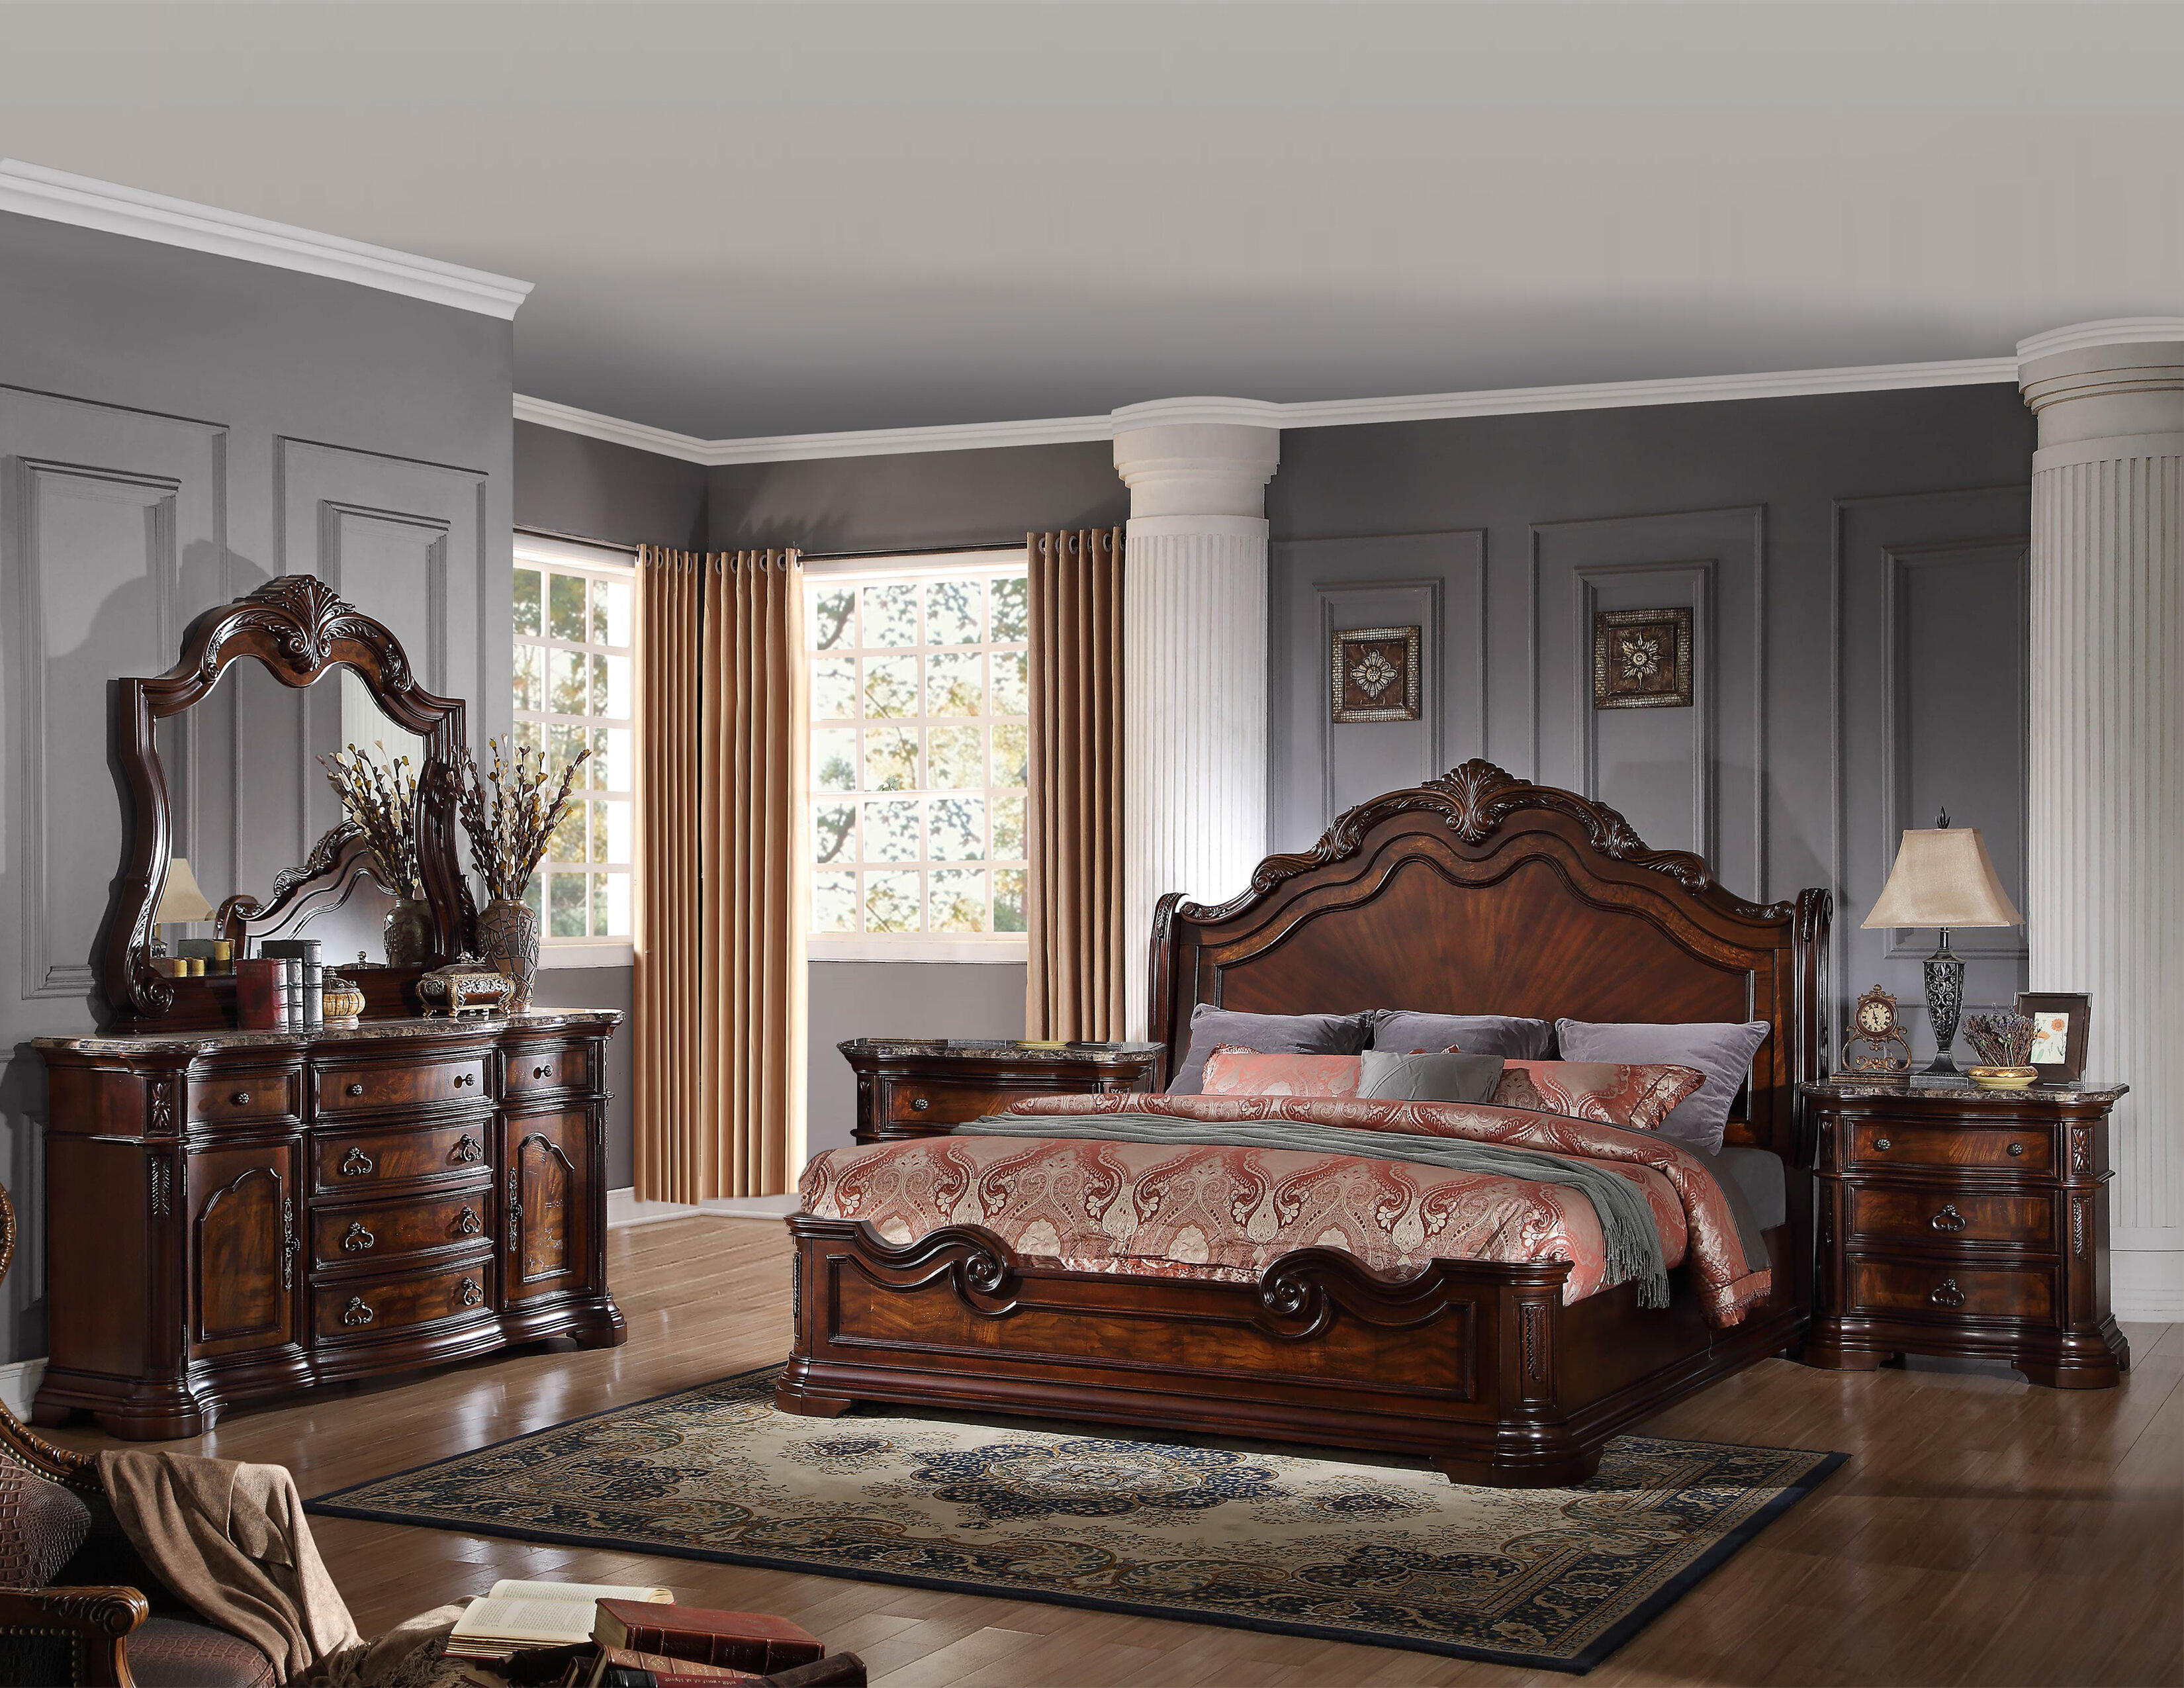 Deco Separation De Piece fletcher standard 5 piece bedroom set